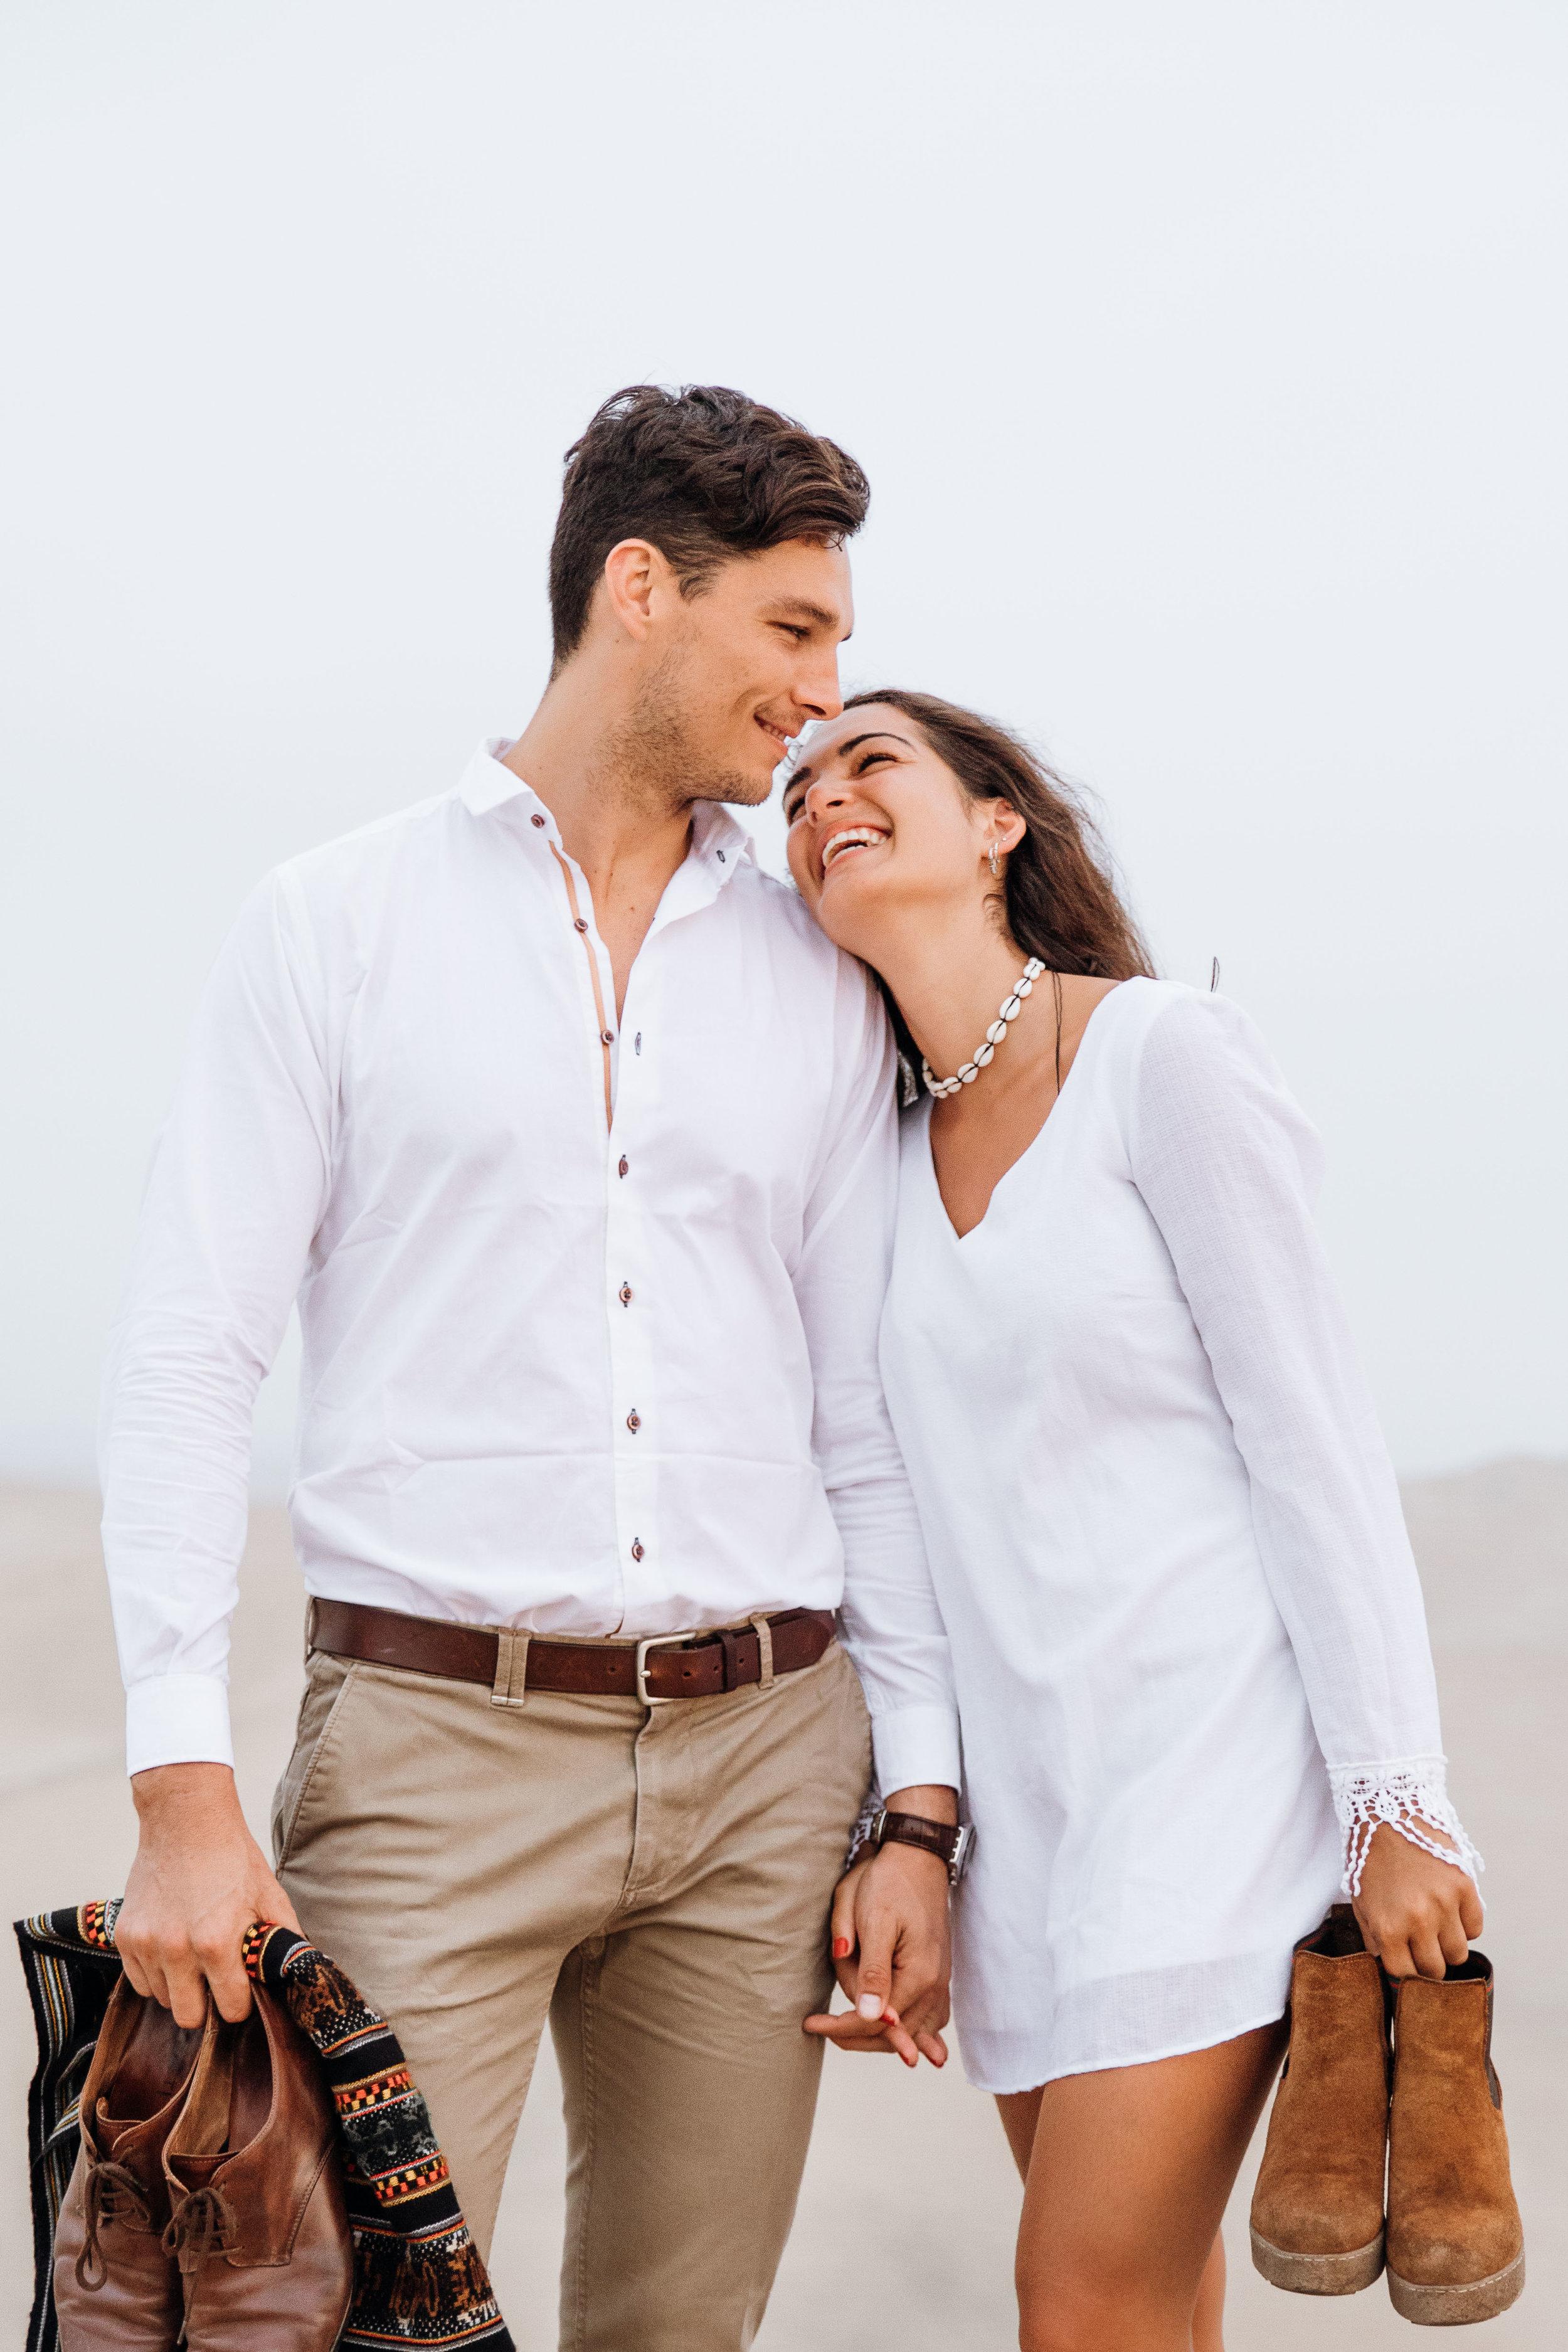 huacachina-peru-honeymoon-elopement-destination-wedding-photography-michael-cozzens-5.jpg